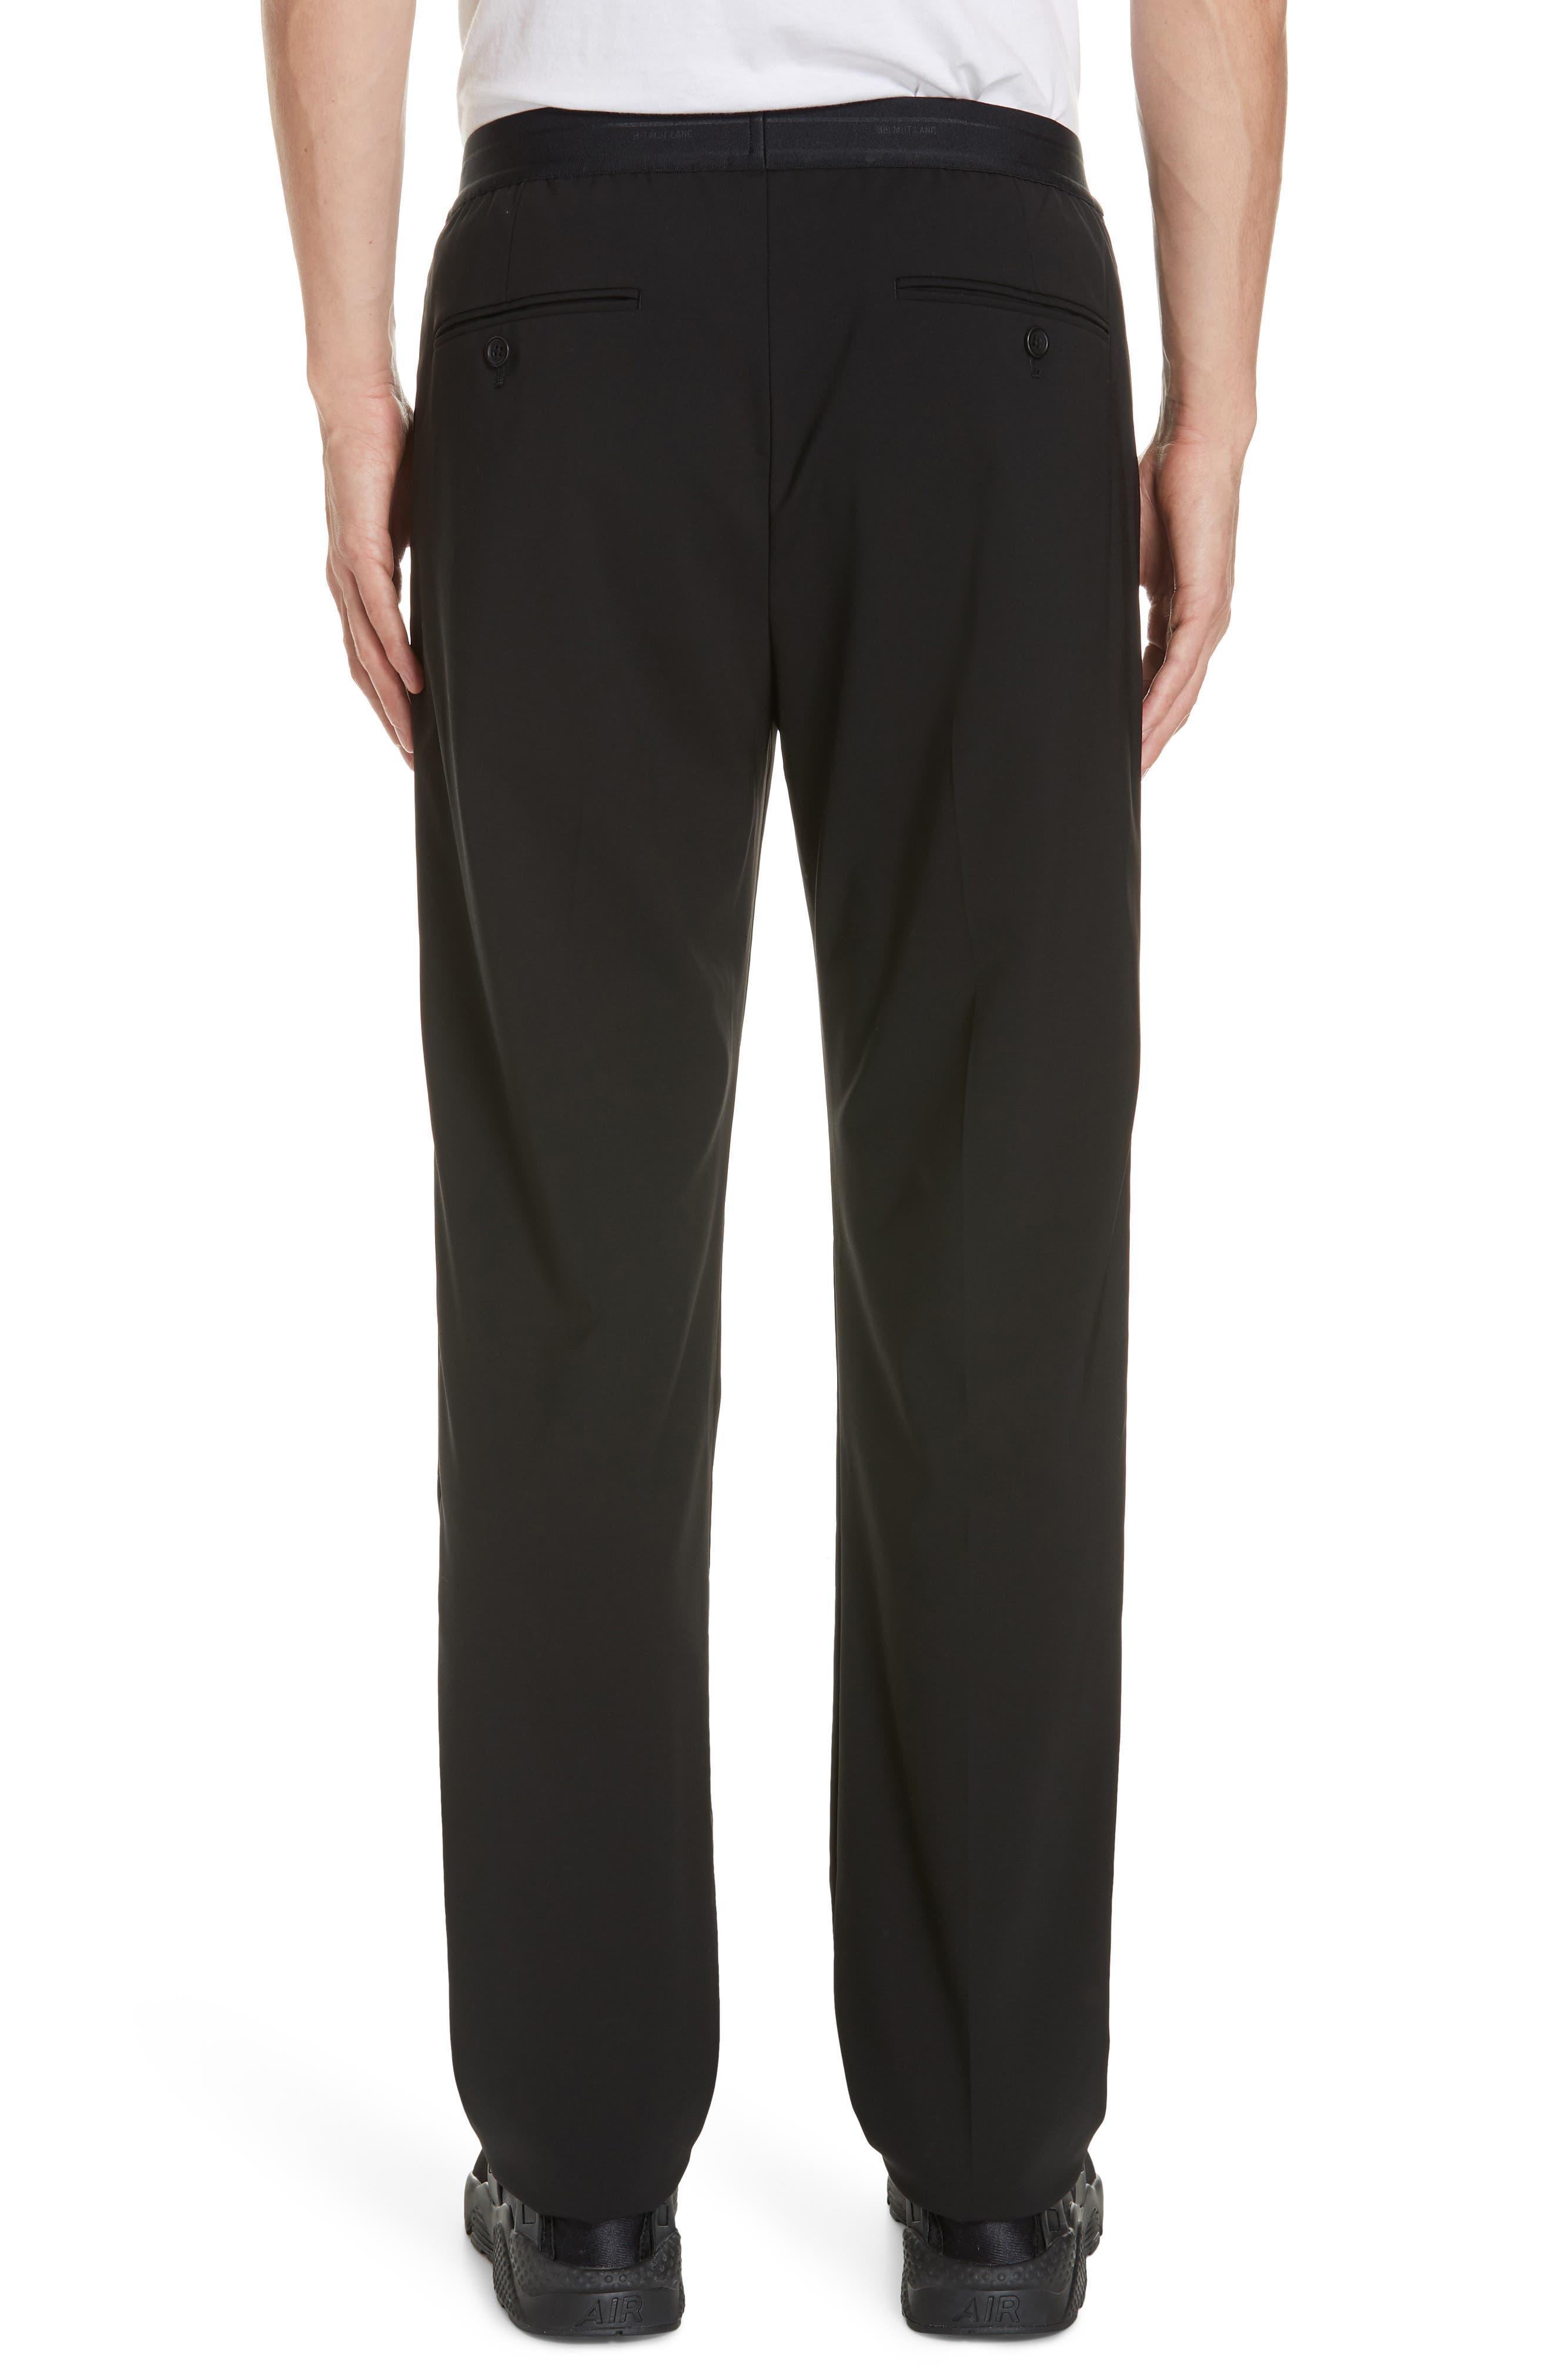 HELMUT LANG, Wool Pants, Alternate thumbnail 2, color, BLACK ON BLACK